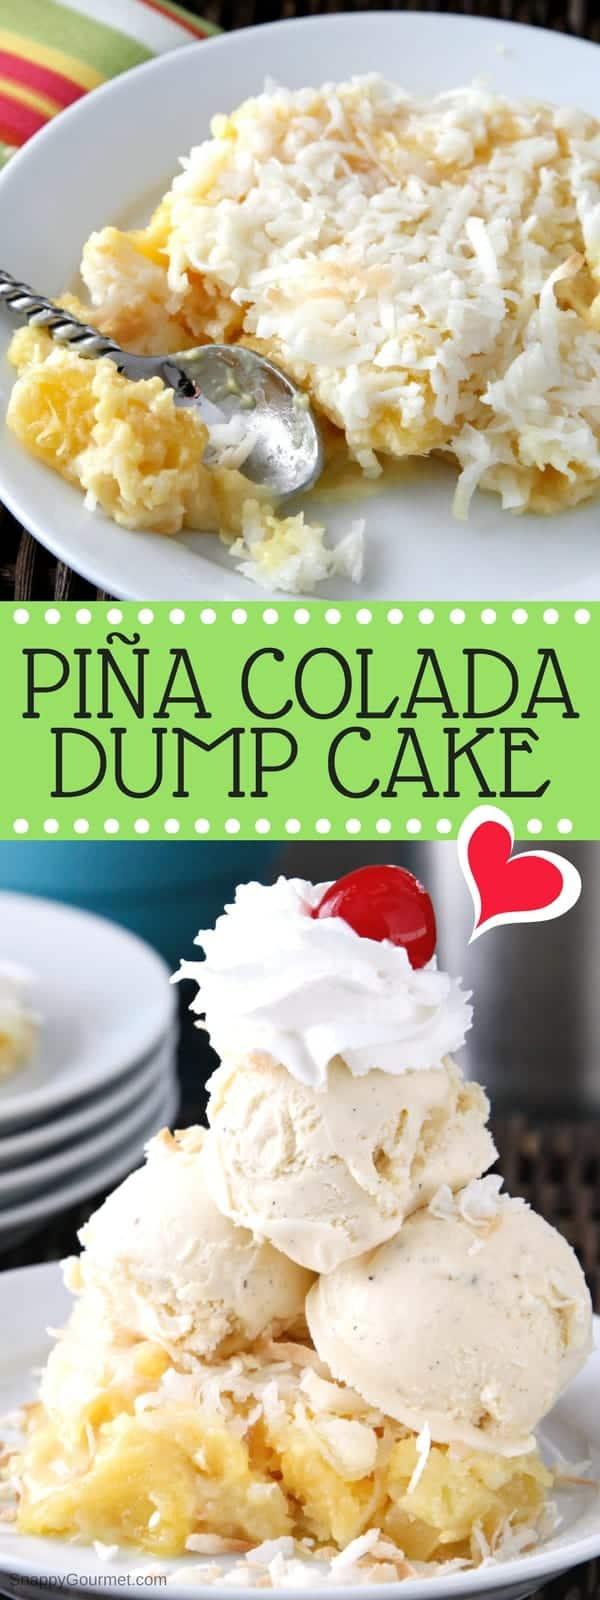 Pina Colada Dump Cake - easy dump cake recipe with pineapple, coconut, and rum. SnappyGourmet.com